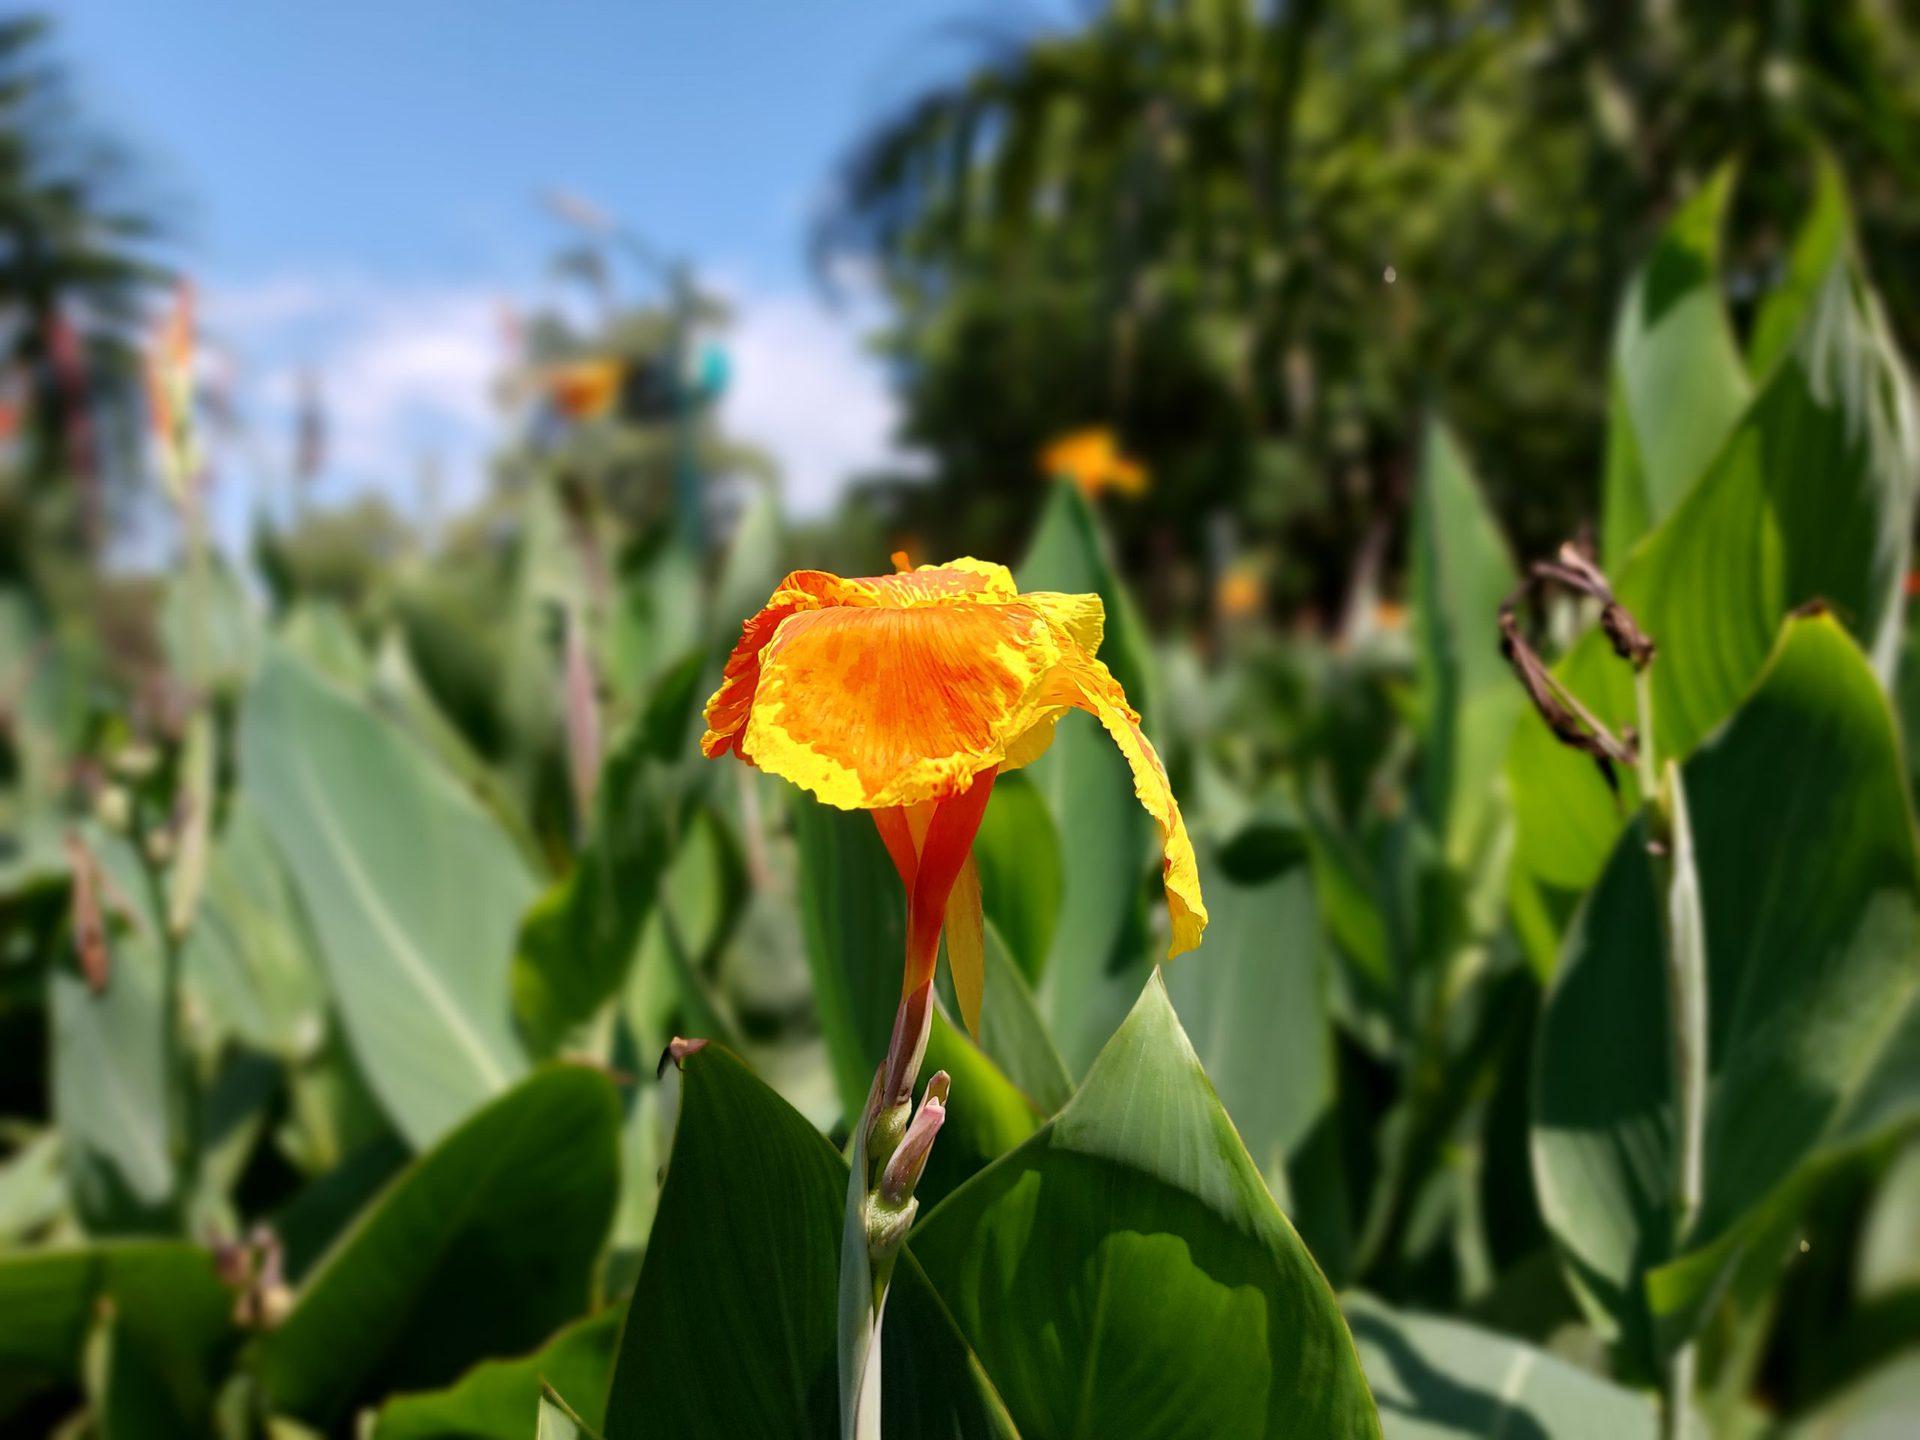 Samsung Galaxy A52s 5G camera sample rear portrait mode shot of orange and green flower.